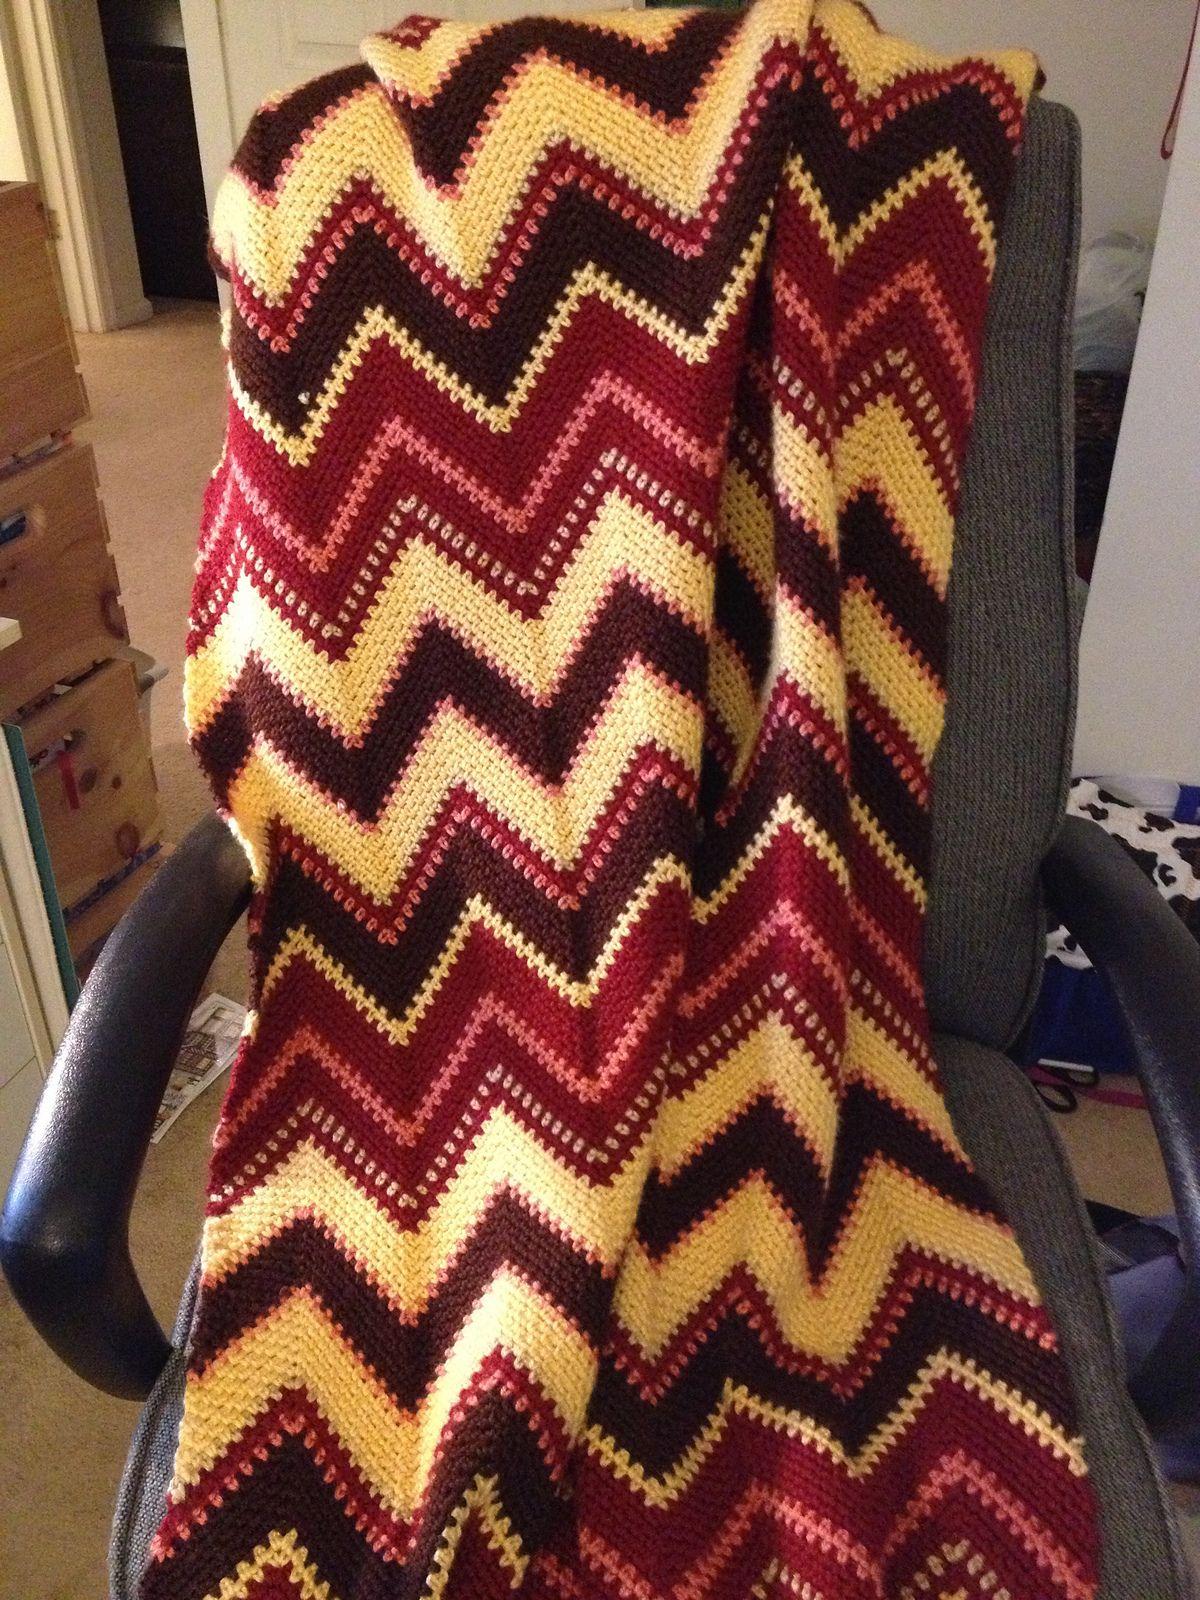 Fall Zig Zag Afghan By Bernat Design Studio - Free Crochet Pattern ...